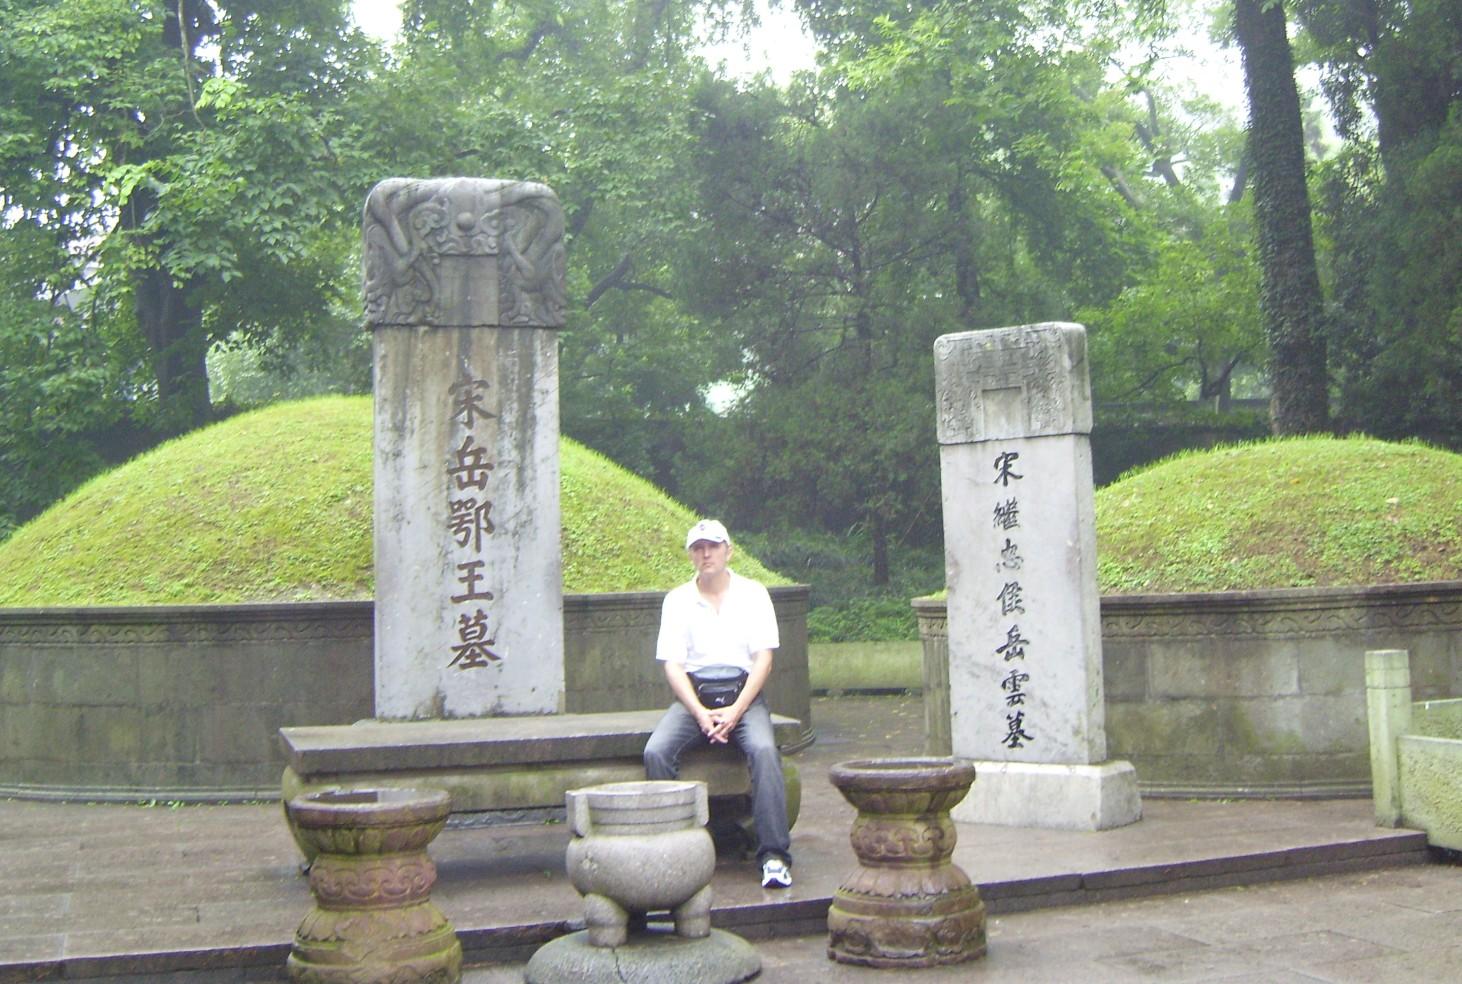 Langa generalul Yue Fei